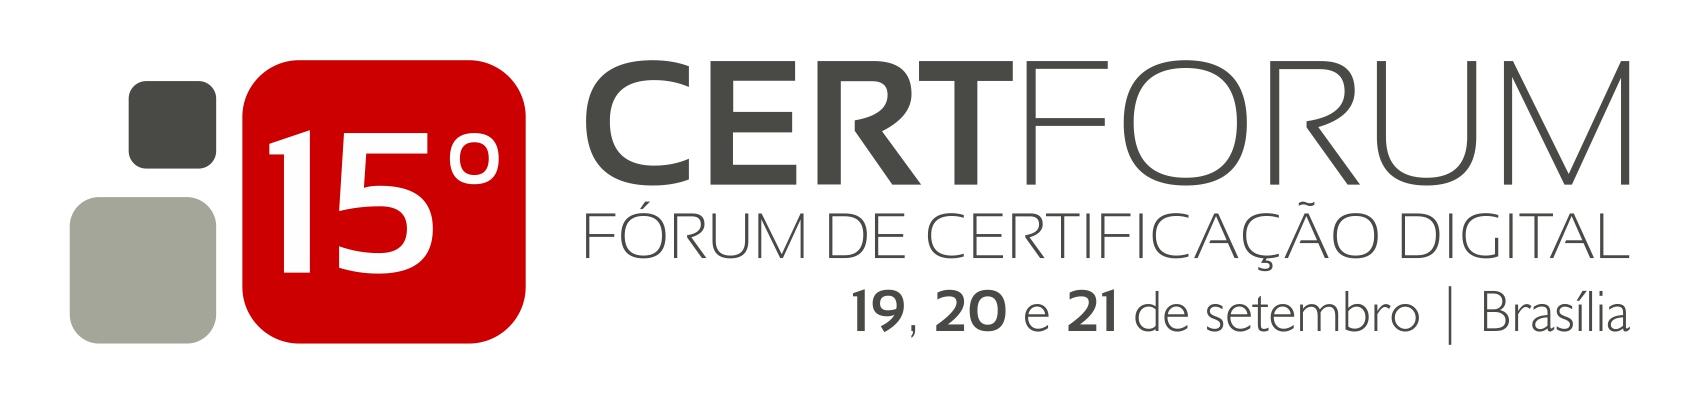 http://certforum.iti.gov.br/2017/wp-content/uploads/2017/06/15-CERTFORUM-logo1.jpg